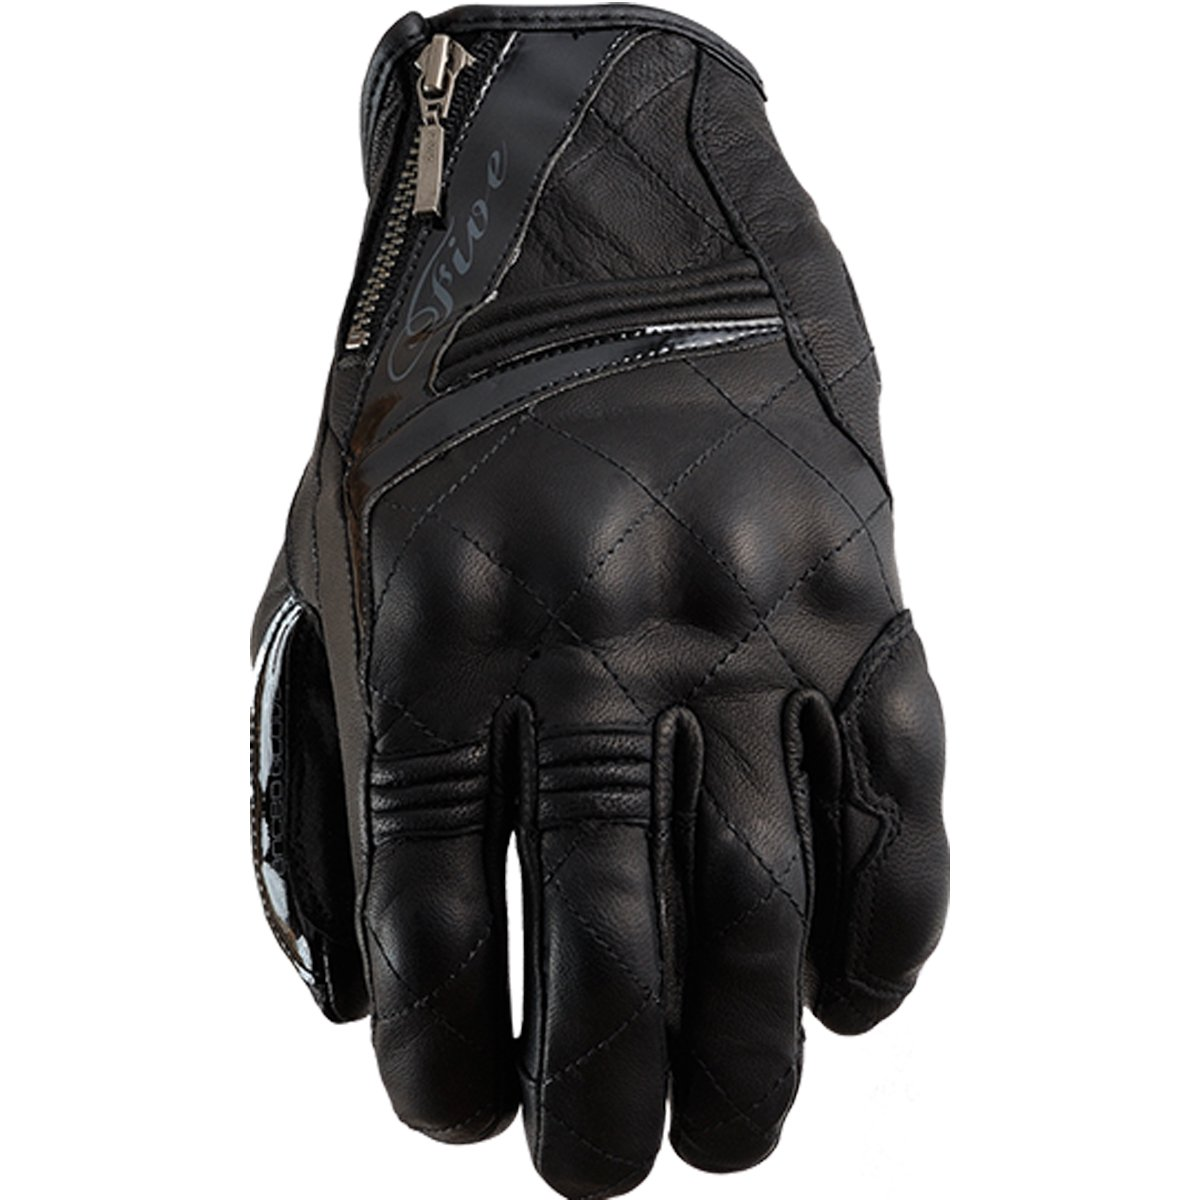 Five5 Sport City Premium Ladies Street/Urban Gloves Black LG